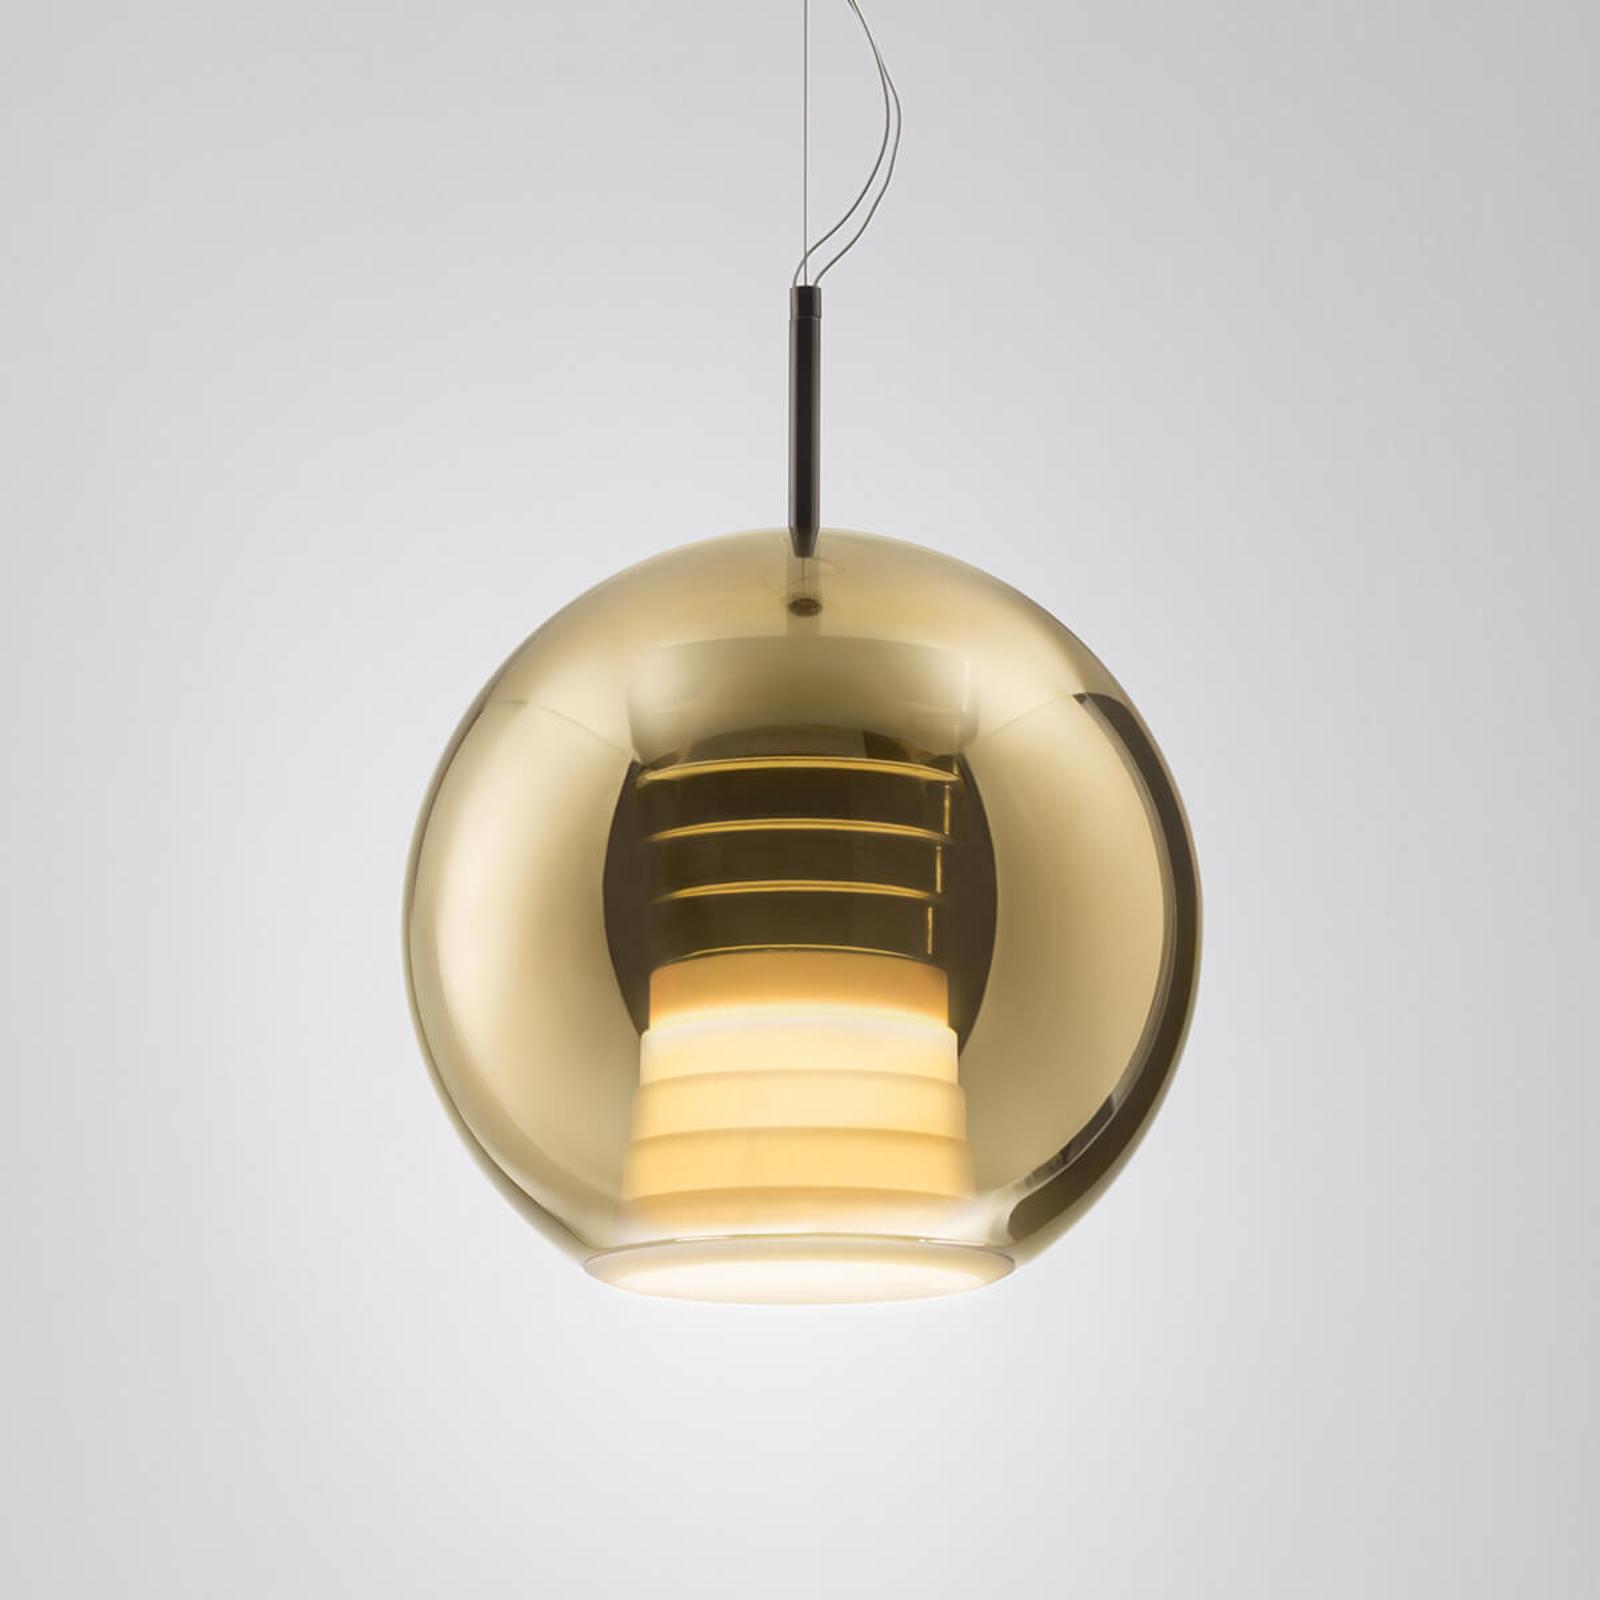 Fabbian Beluga Royal -LED-riippuvalo kulta 30cm